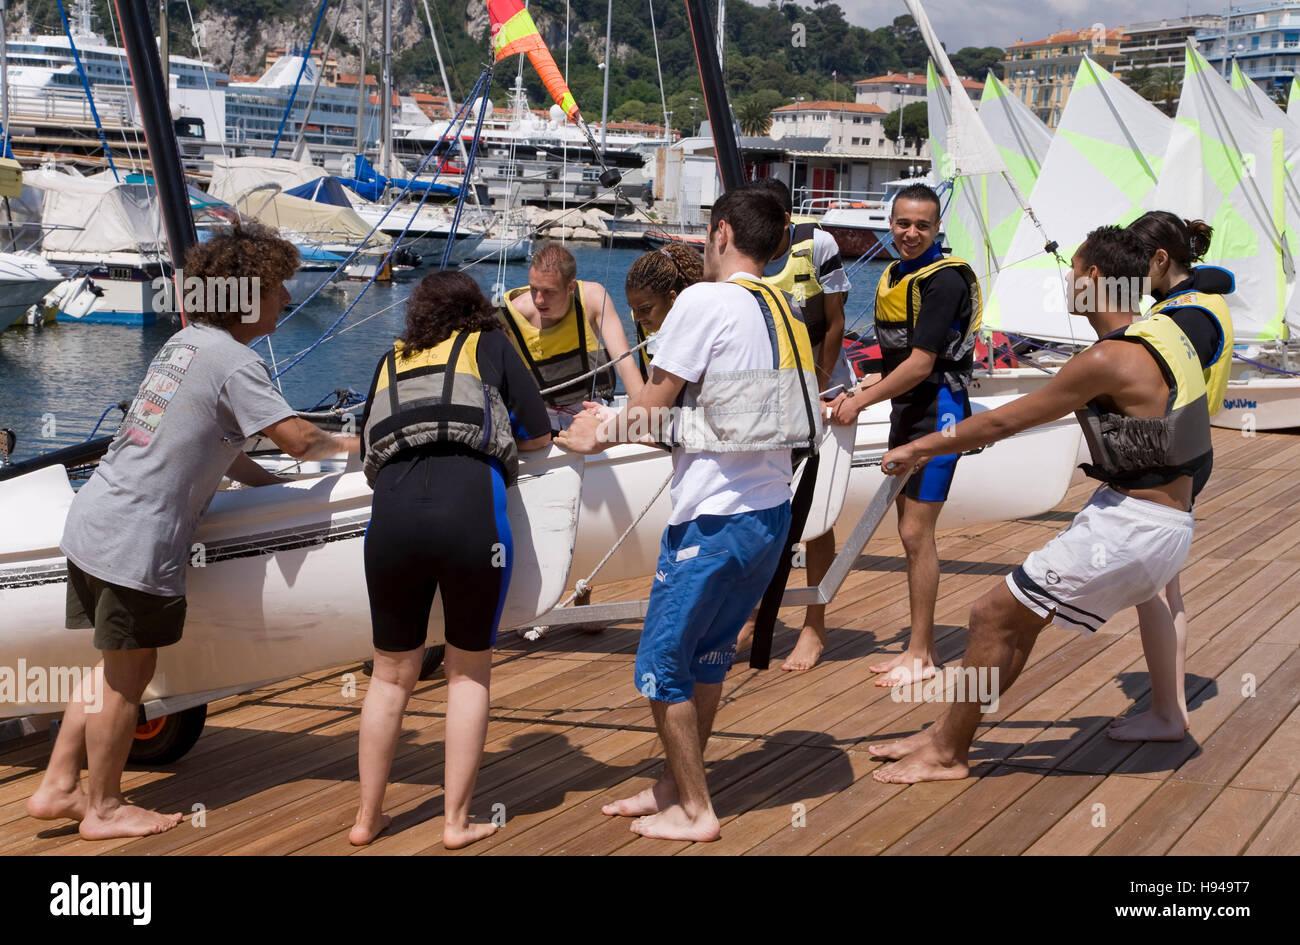 Club Nautique De Nice teenagers with a catamaran at the club nautique, sailboat